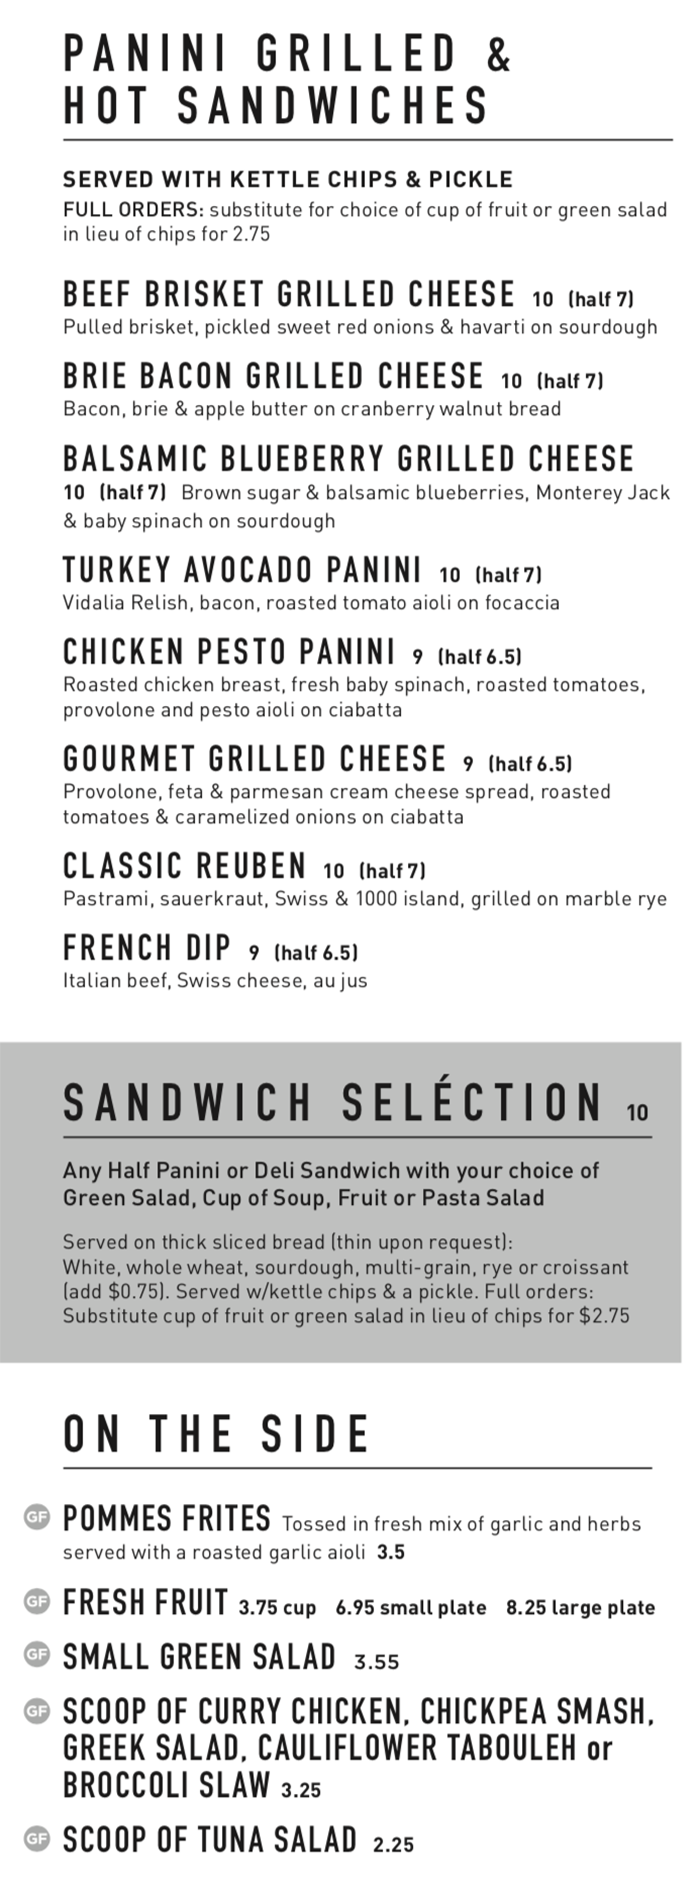 Gourmandise lunch menu - panini, sandwiches, sides